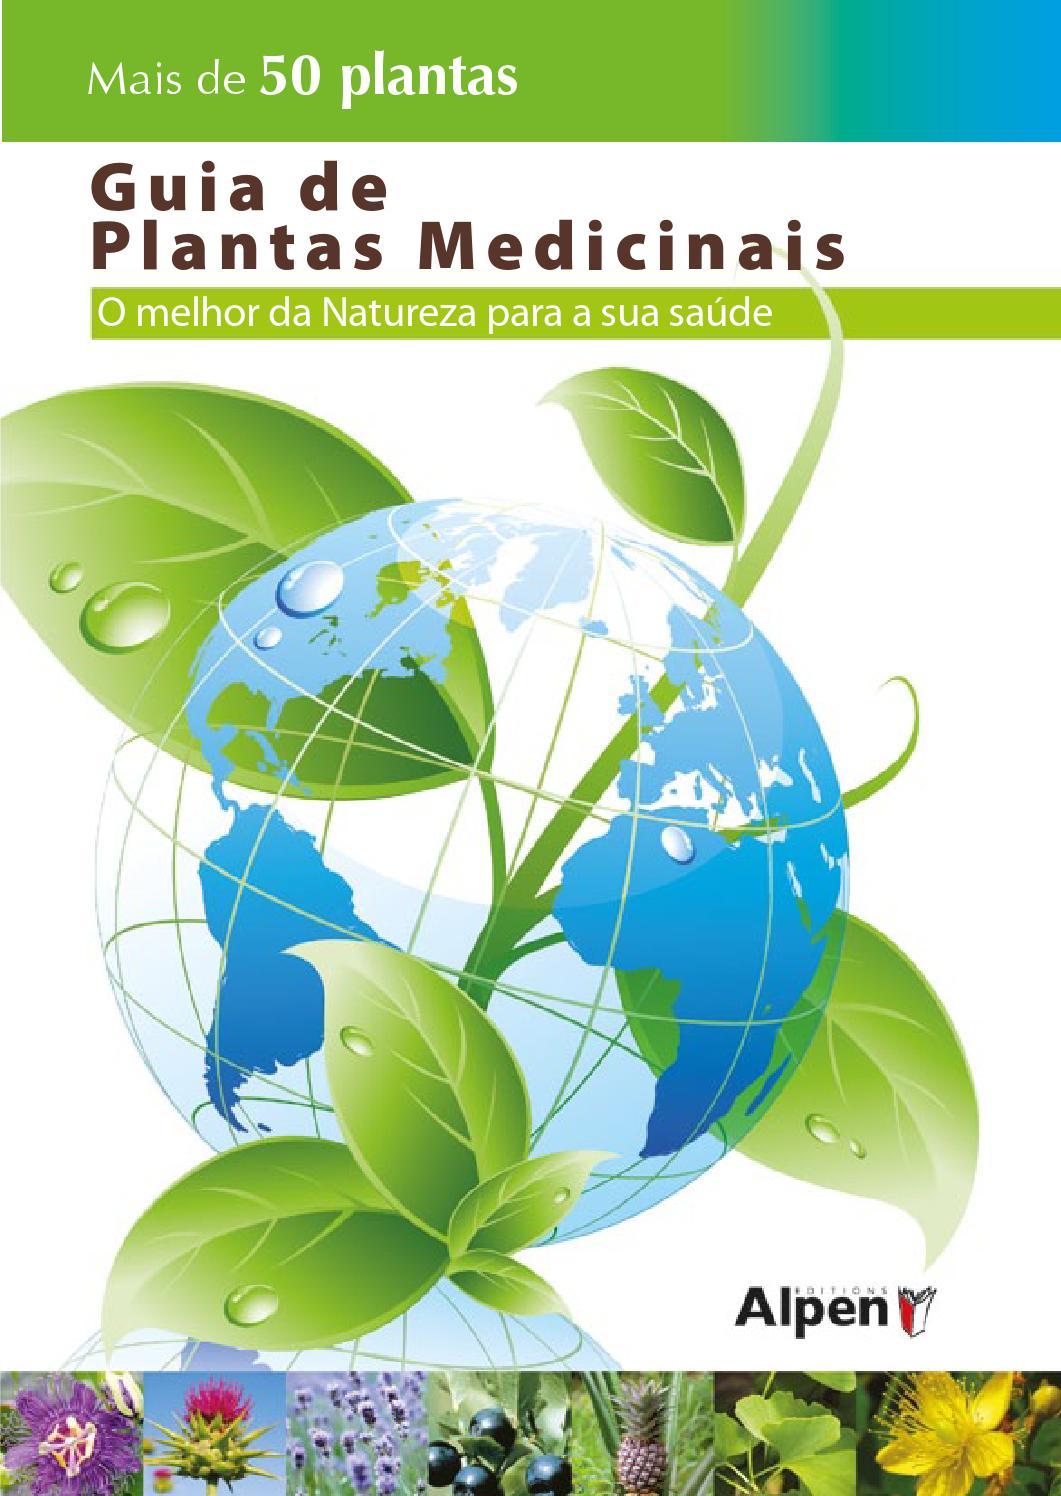 Kelor Super Nutrisi By A Dudi Krisnadi Issuu Bibit Biji Hitam Organic 100gram Guia De Plantas Medicinais 2015